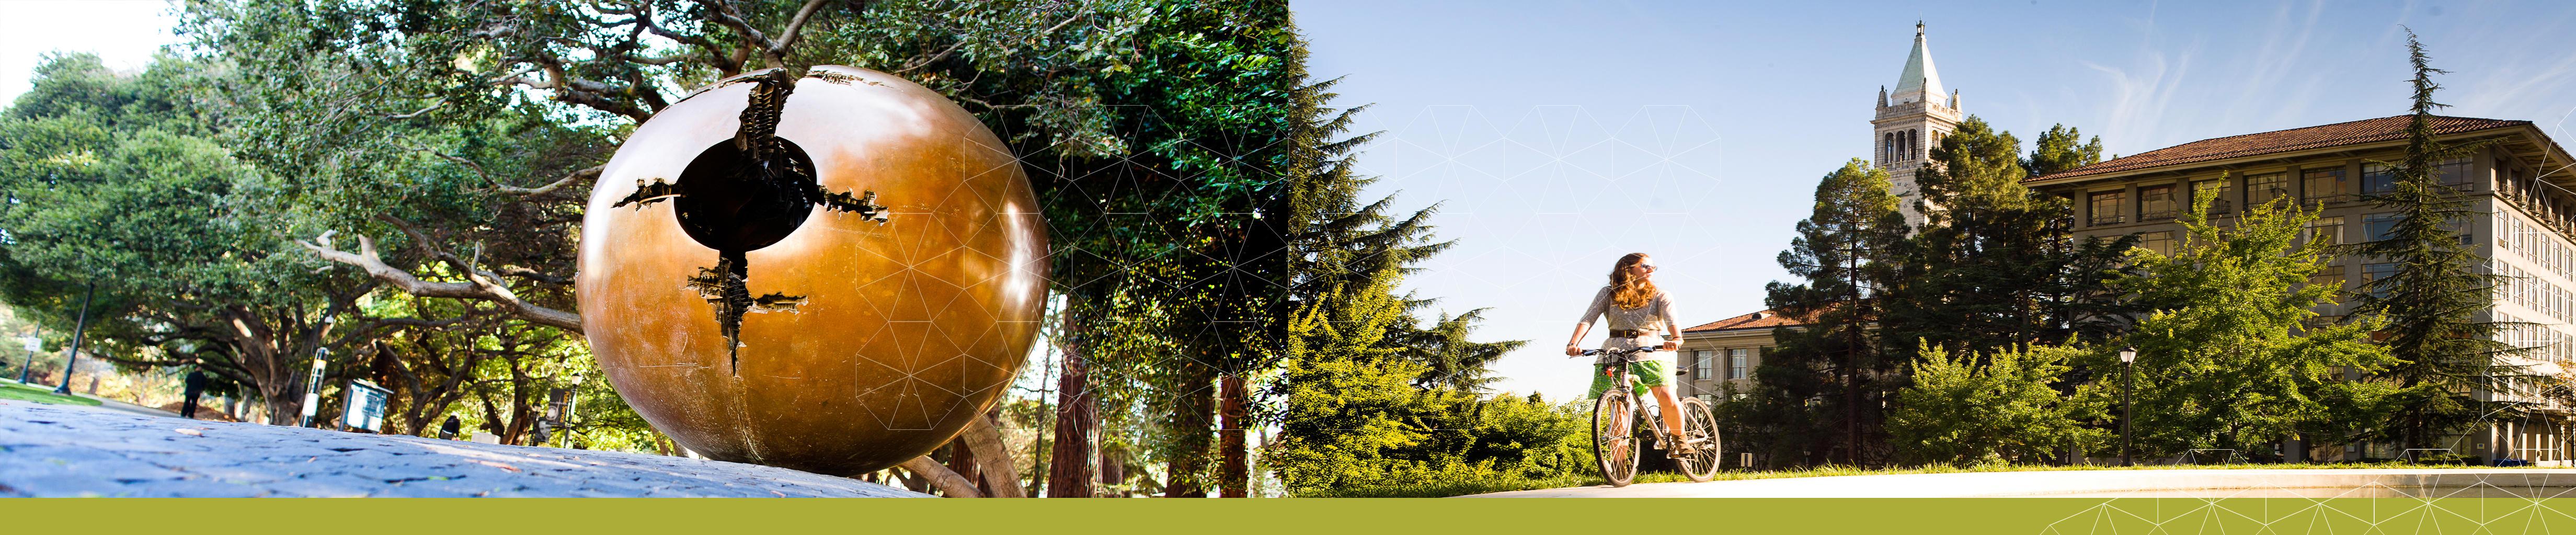 Campus Landmark Photos